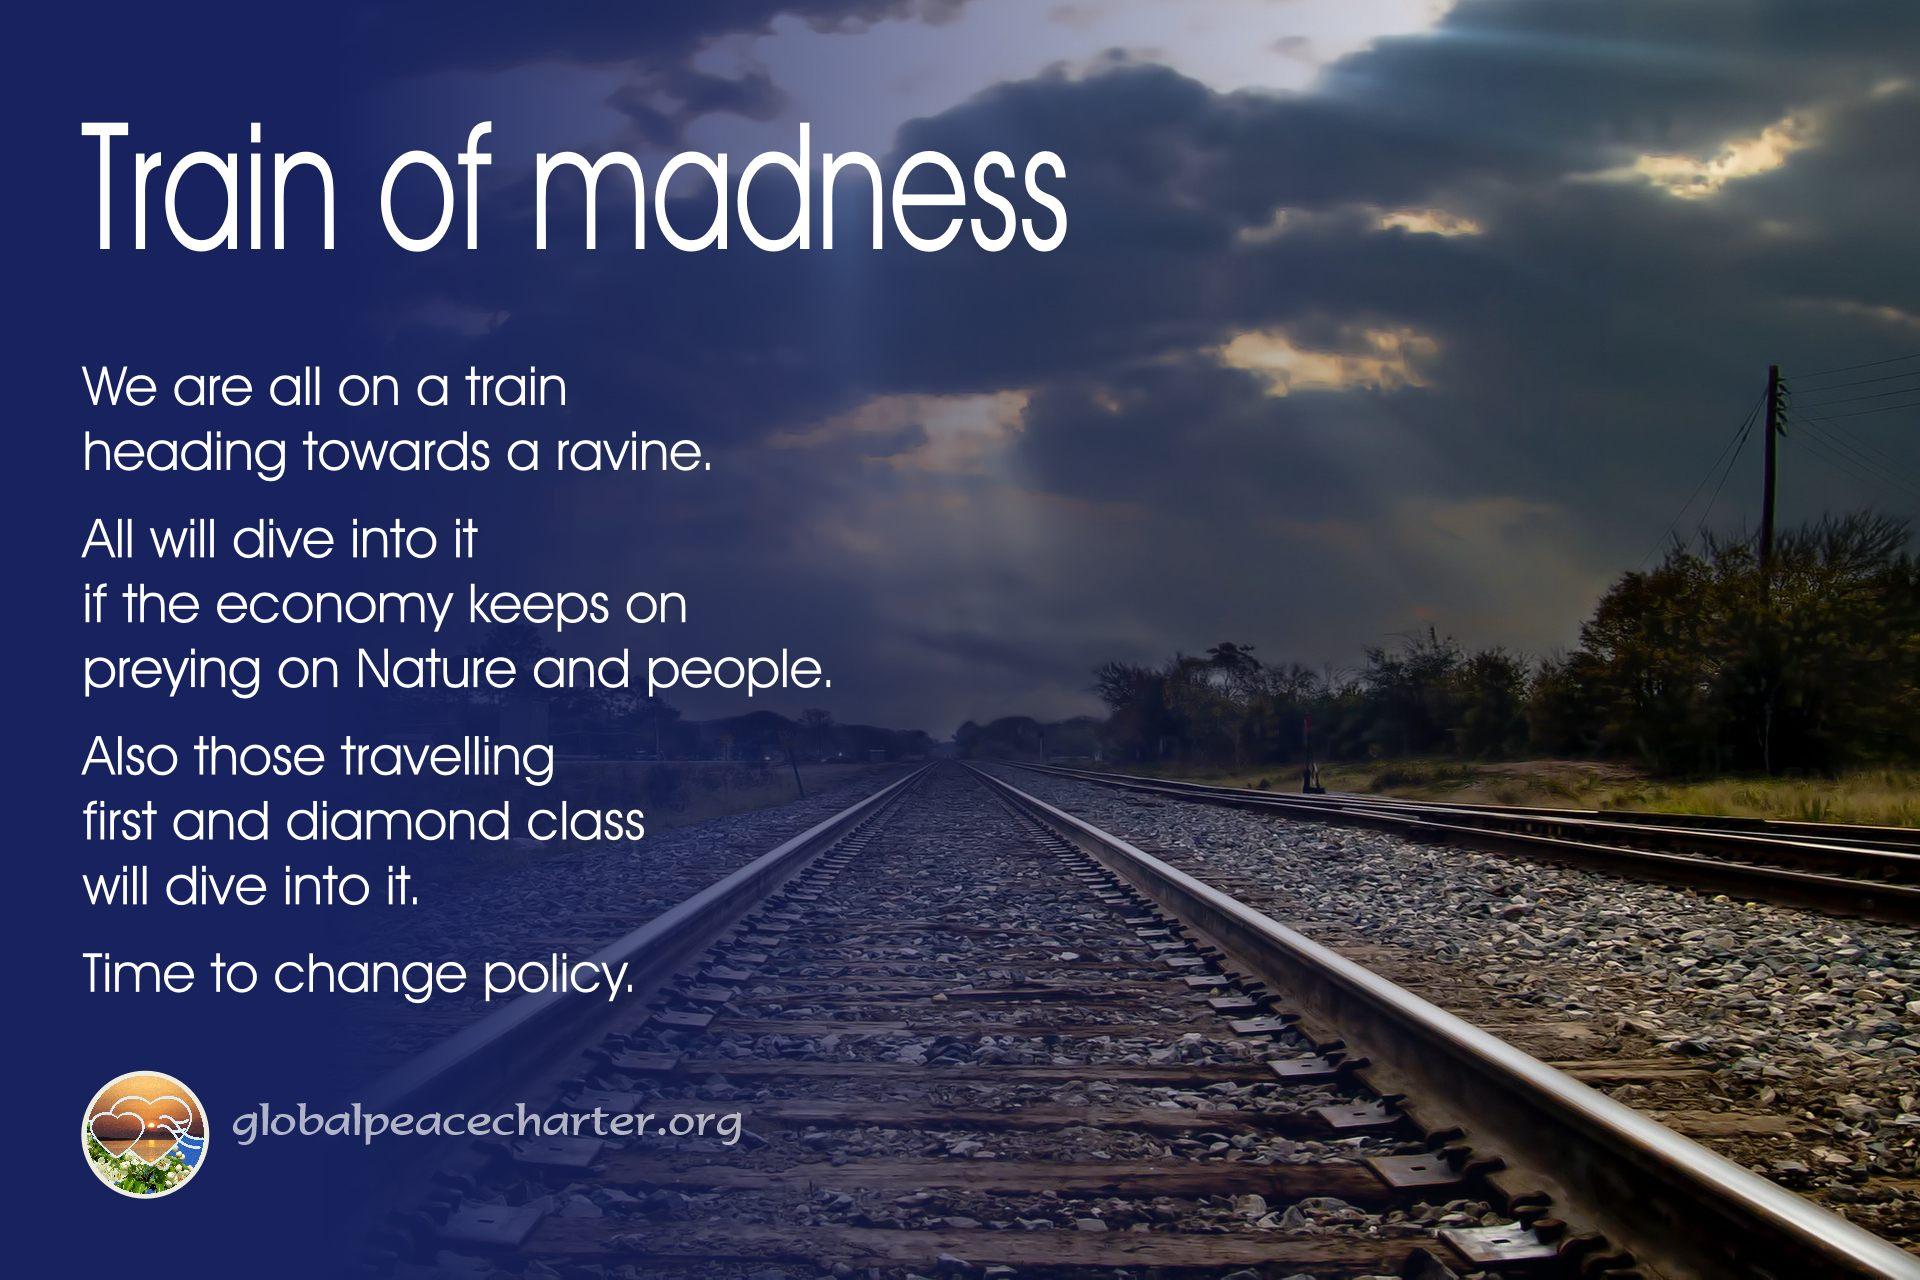 Train of madness